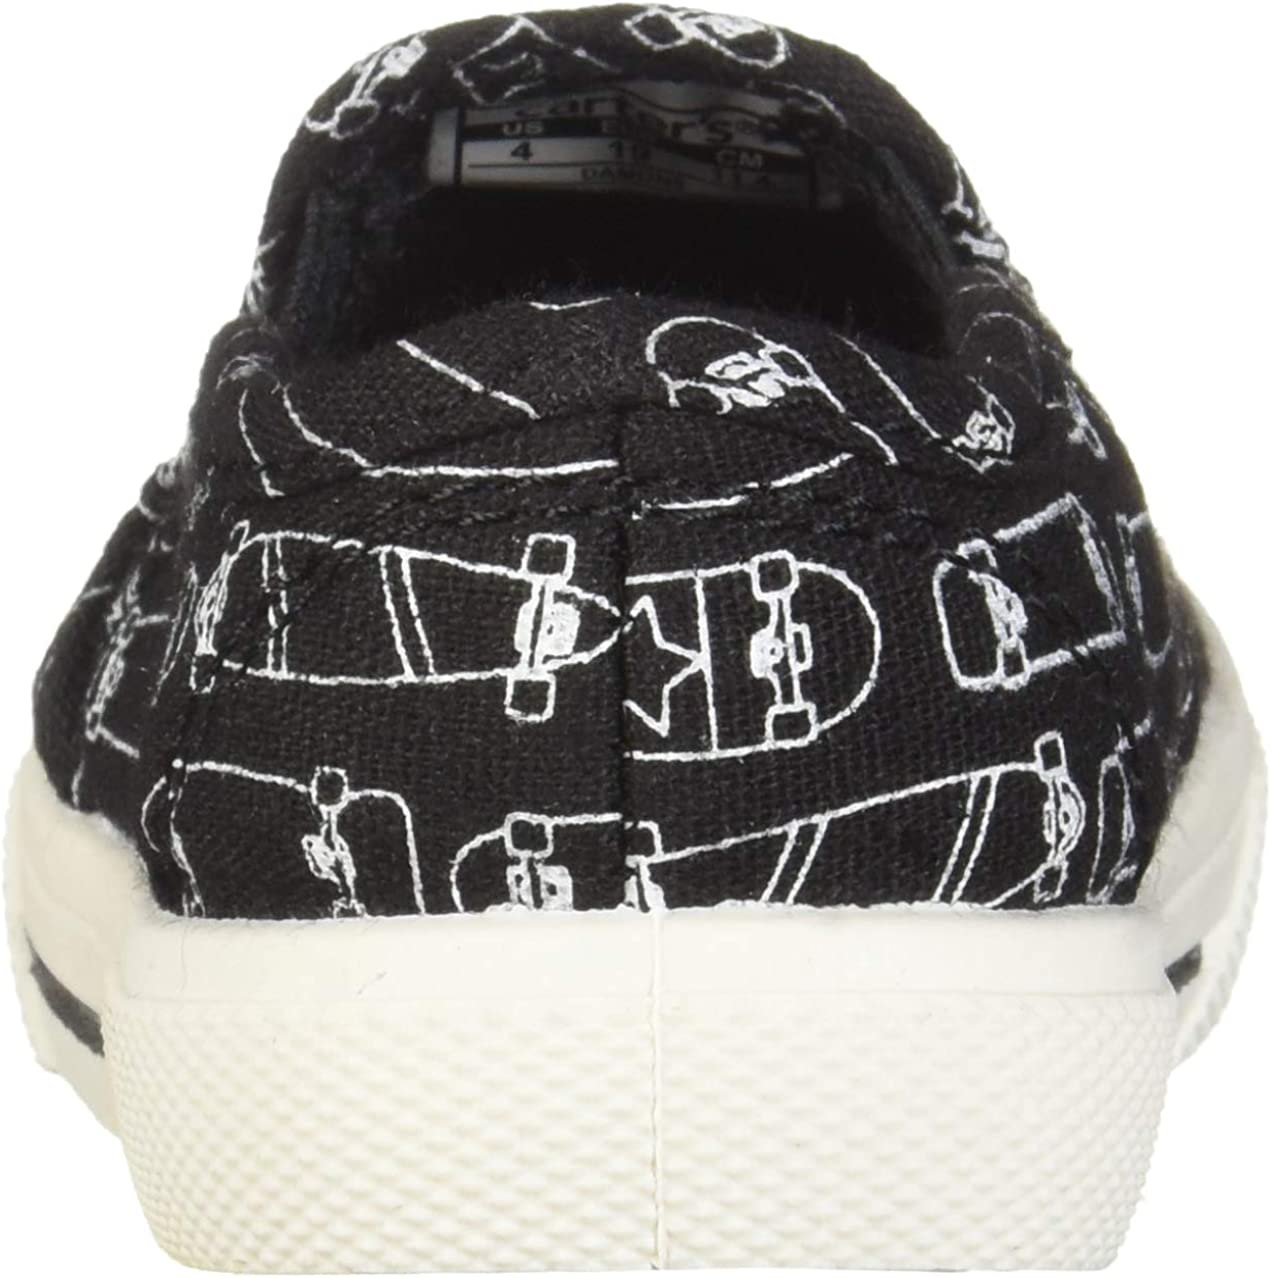 Carters Kids Damon Boys Casual Slip-on Sneaker Skate Shoe